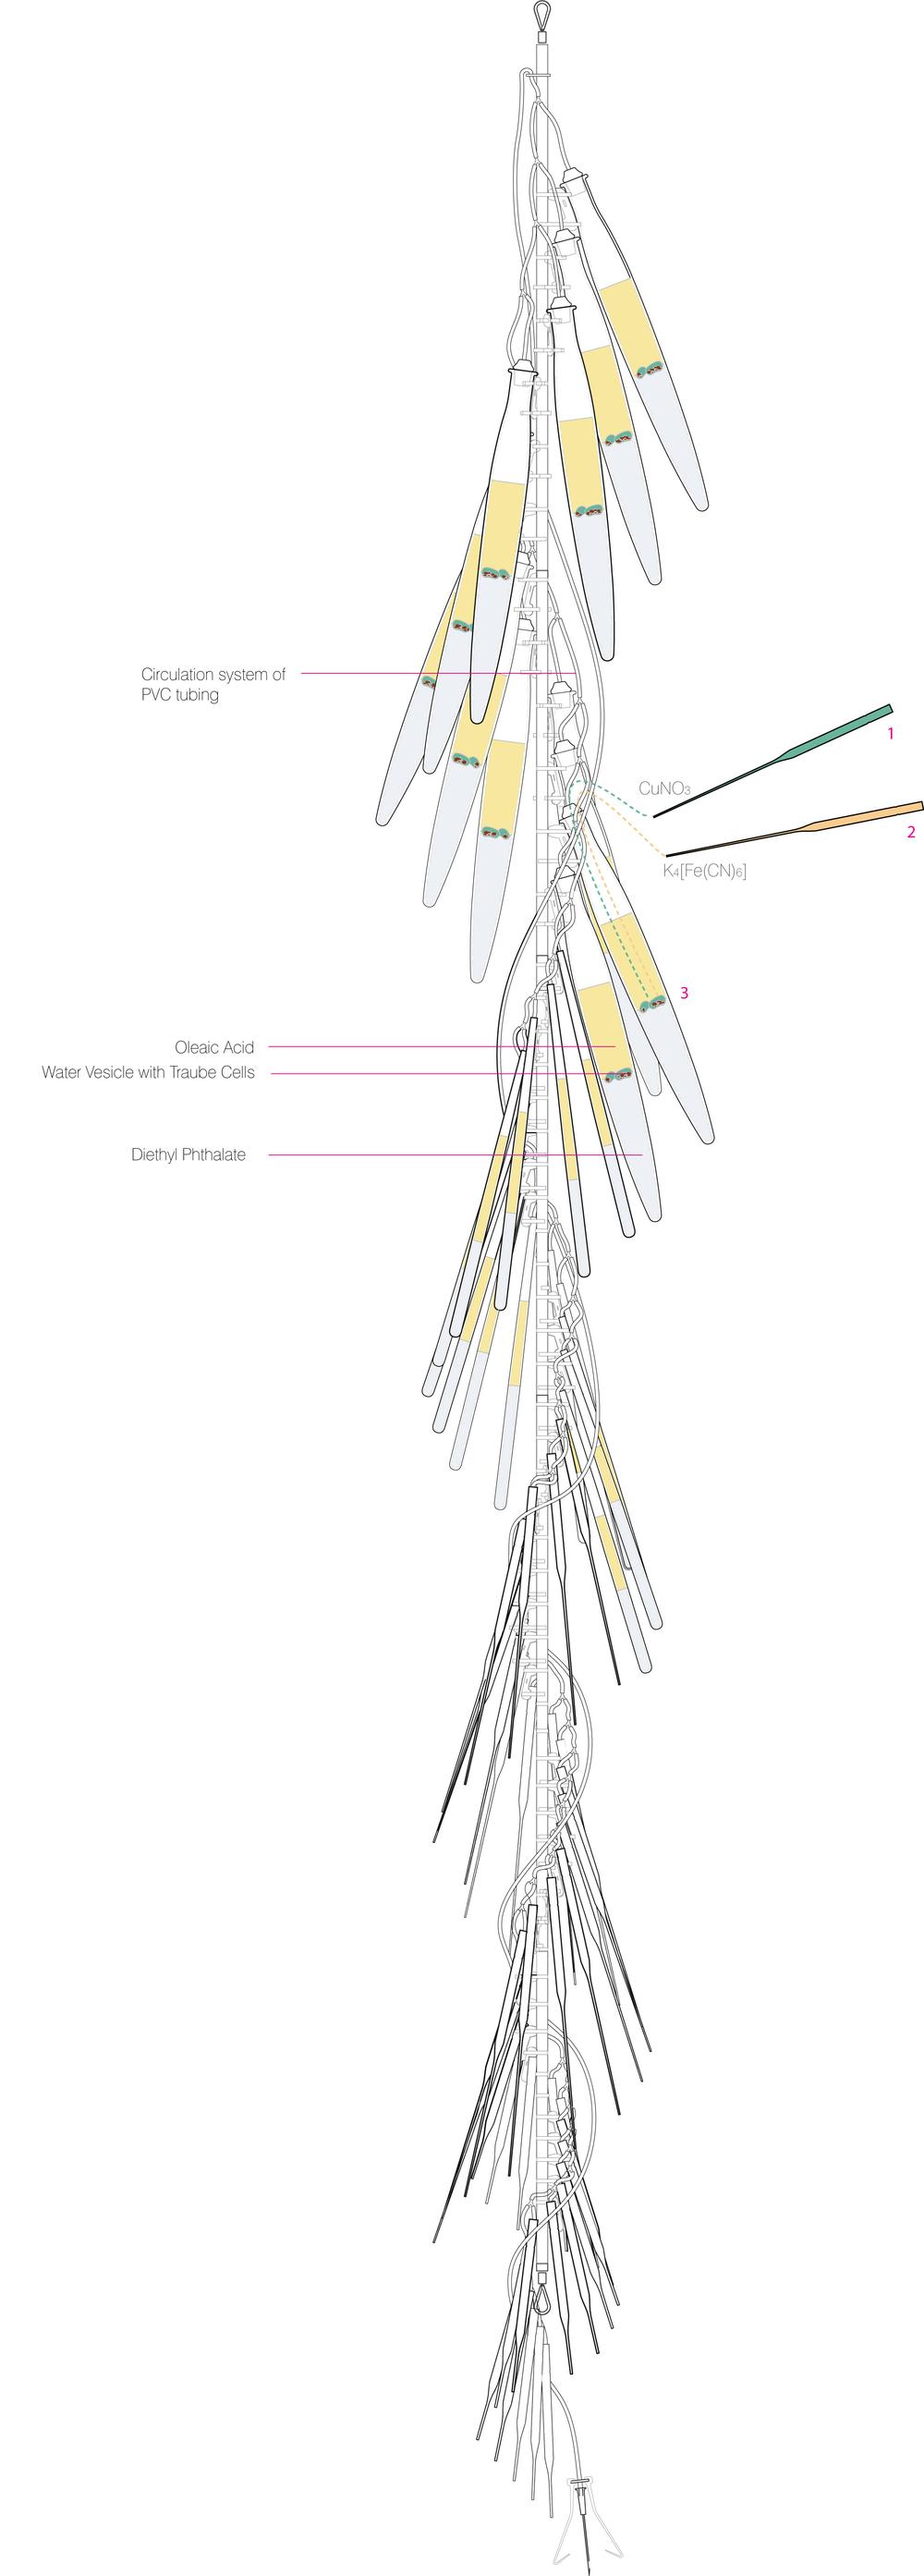 12F18-1036 Carrot Chain Diagram.jpg